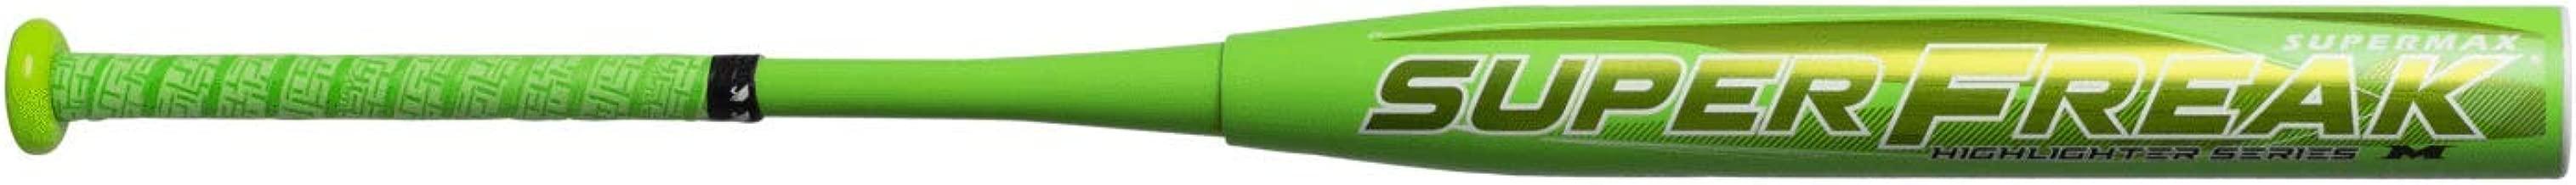 Miken 2019 Limited Edition Superfreak Supermax Highlighter USSSA Slowpitch Softball Bat (MHS14U)